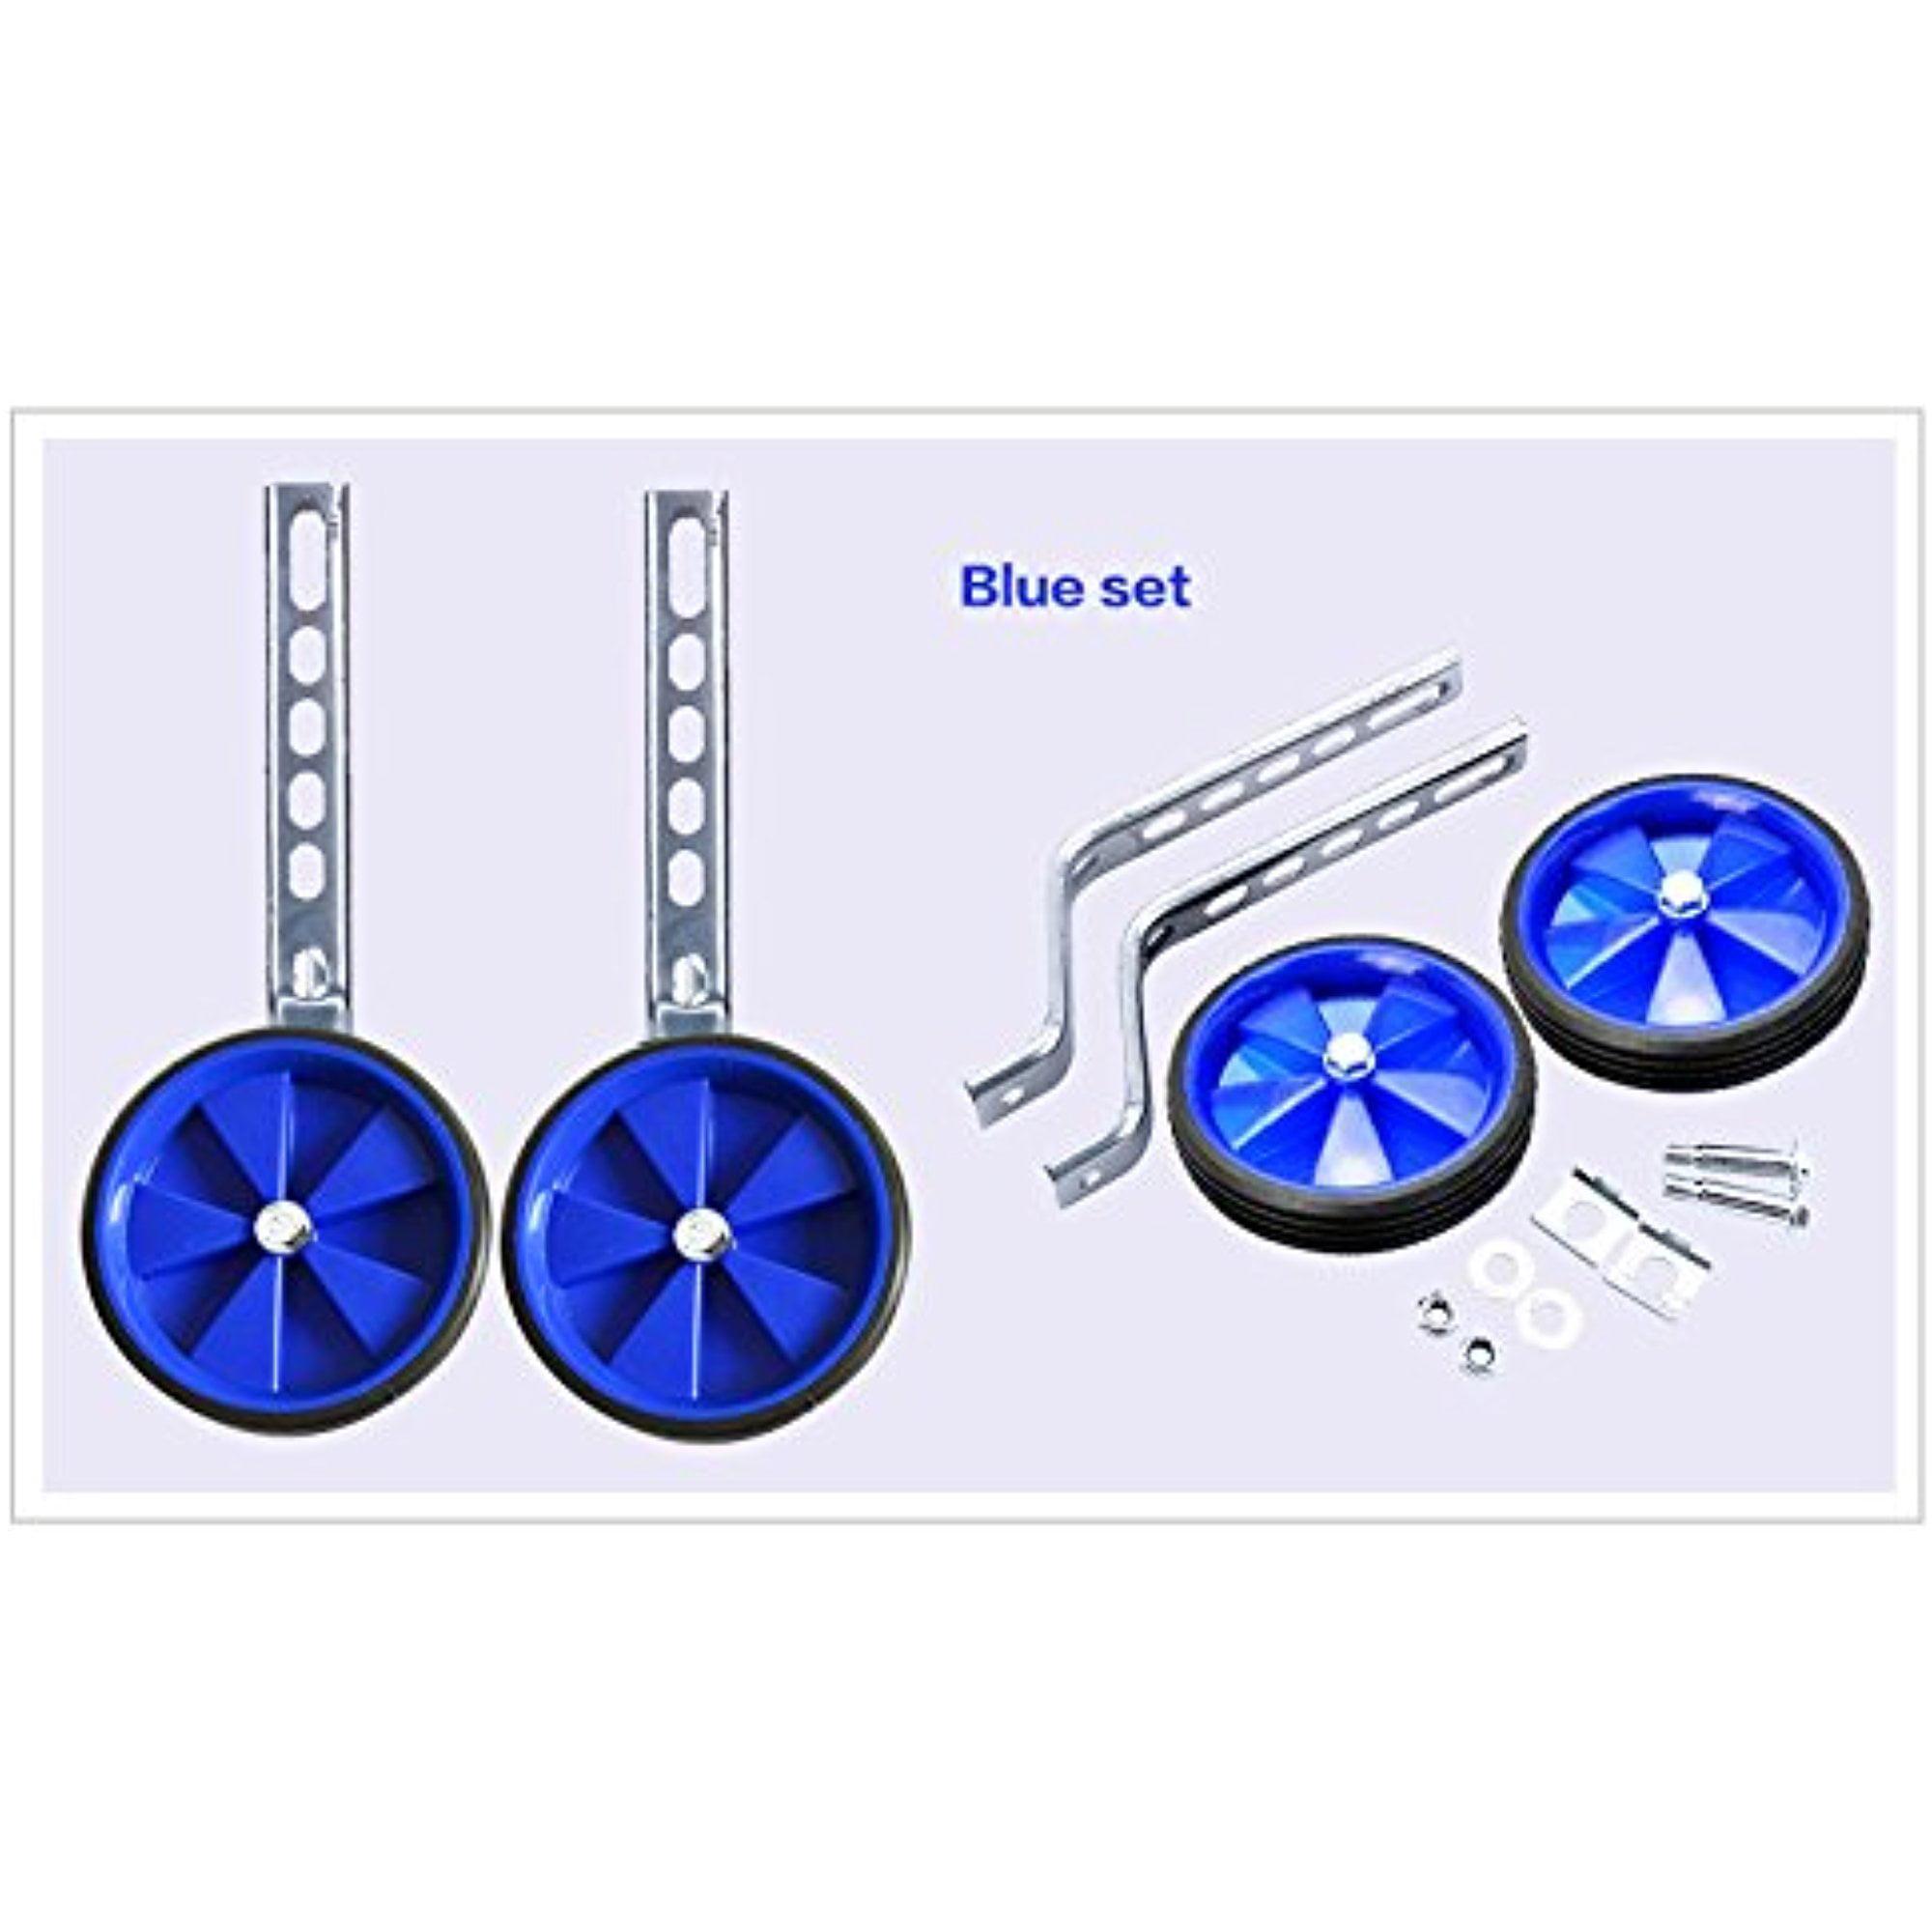 "Estink Children's Bicycle Training Wheels, Universal 10-22"" Bike accessories Stabiliser for Kids,Blue"